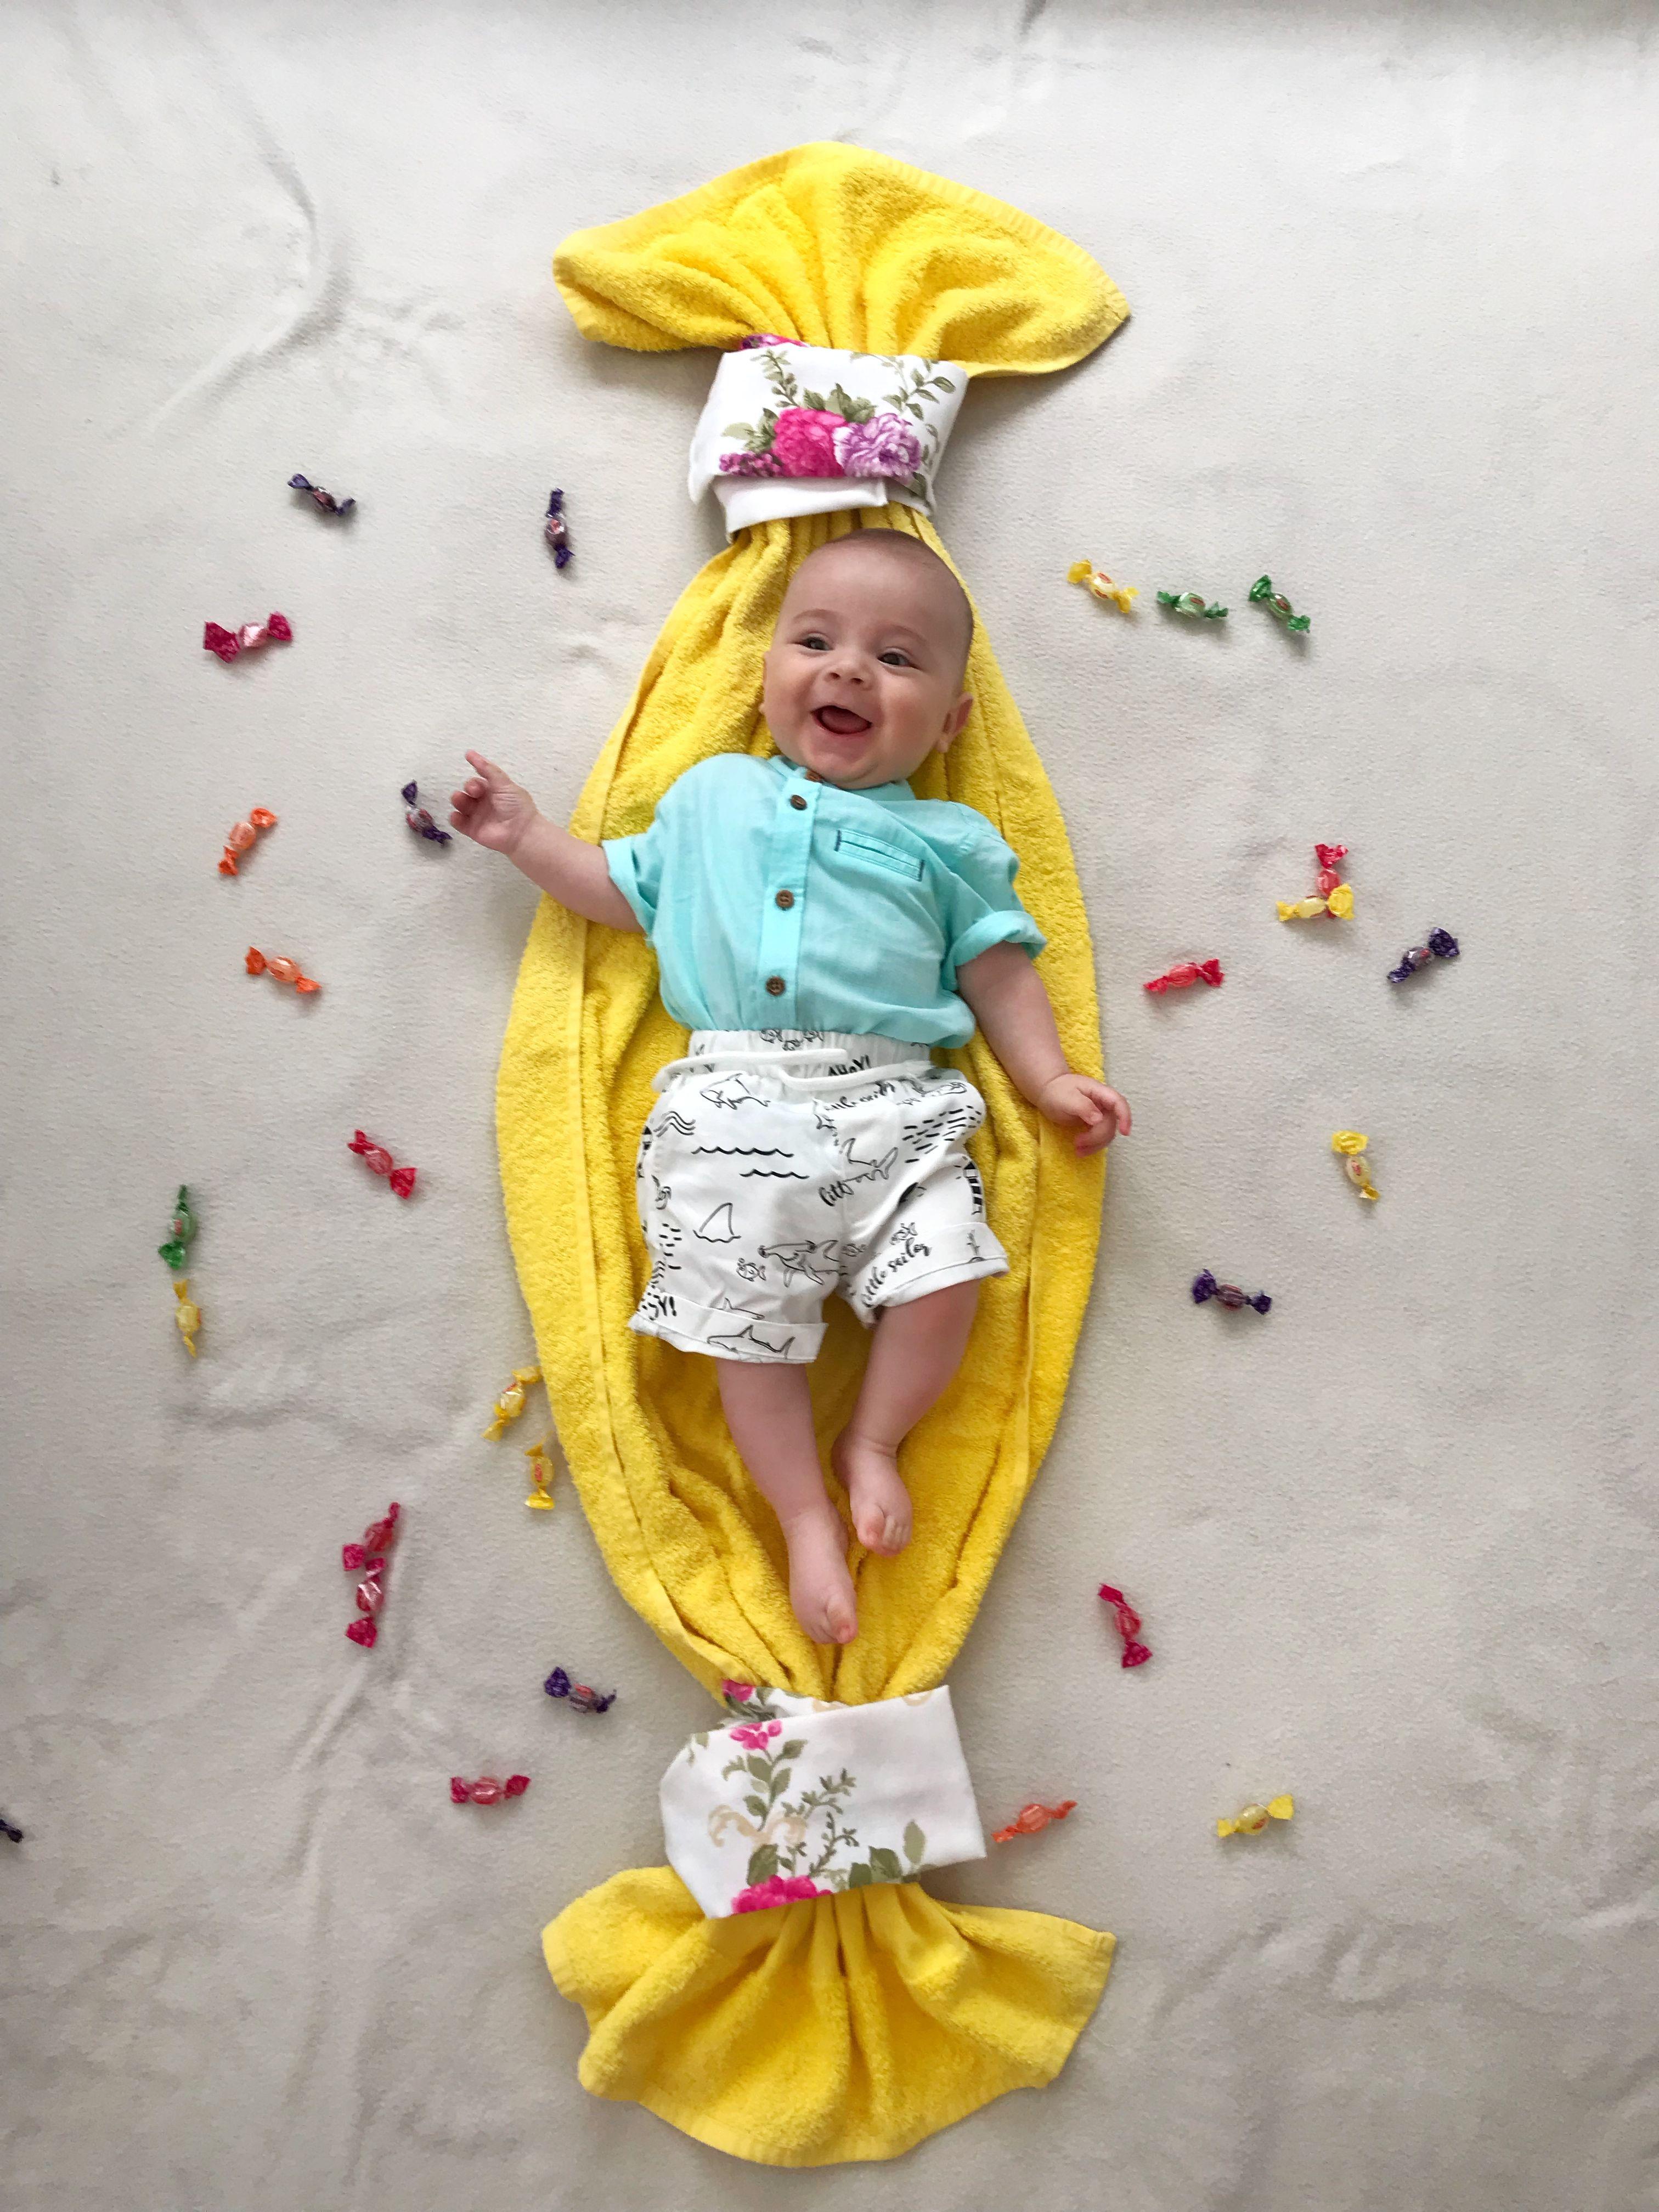 Jagruti Agrawal Adli Kullanicinin Baby Boy Photography Panosundaki Pin Bebek Fotograflari Kiz Bebek Fotografciligi Yenidogan Resimleri